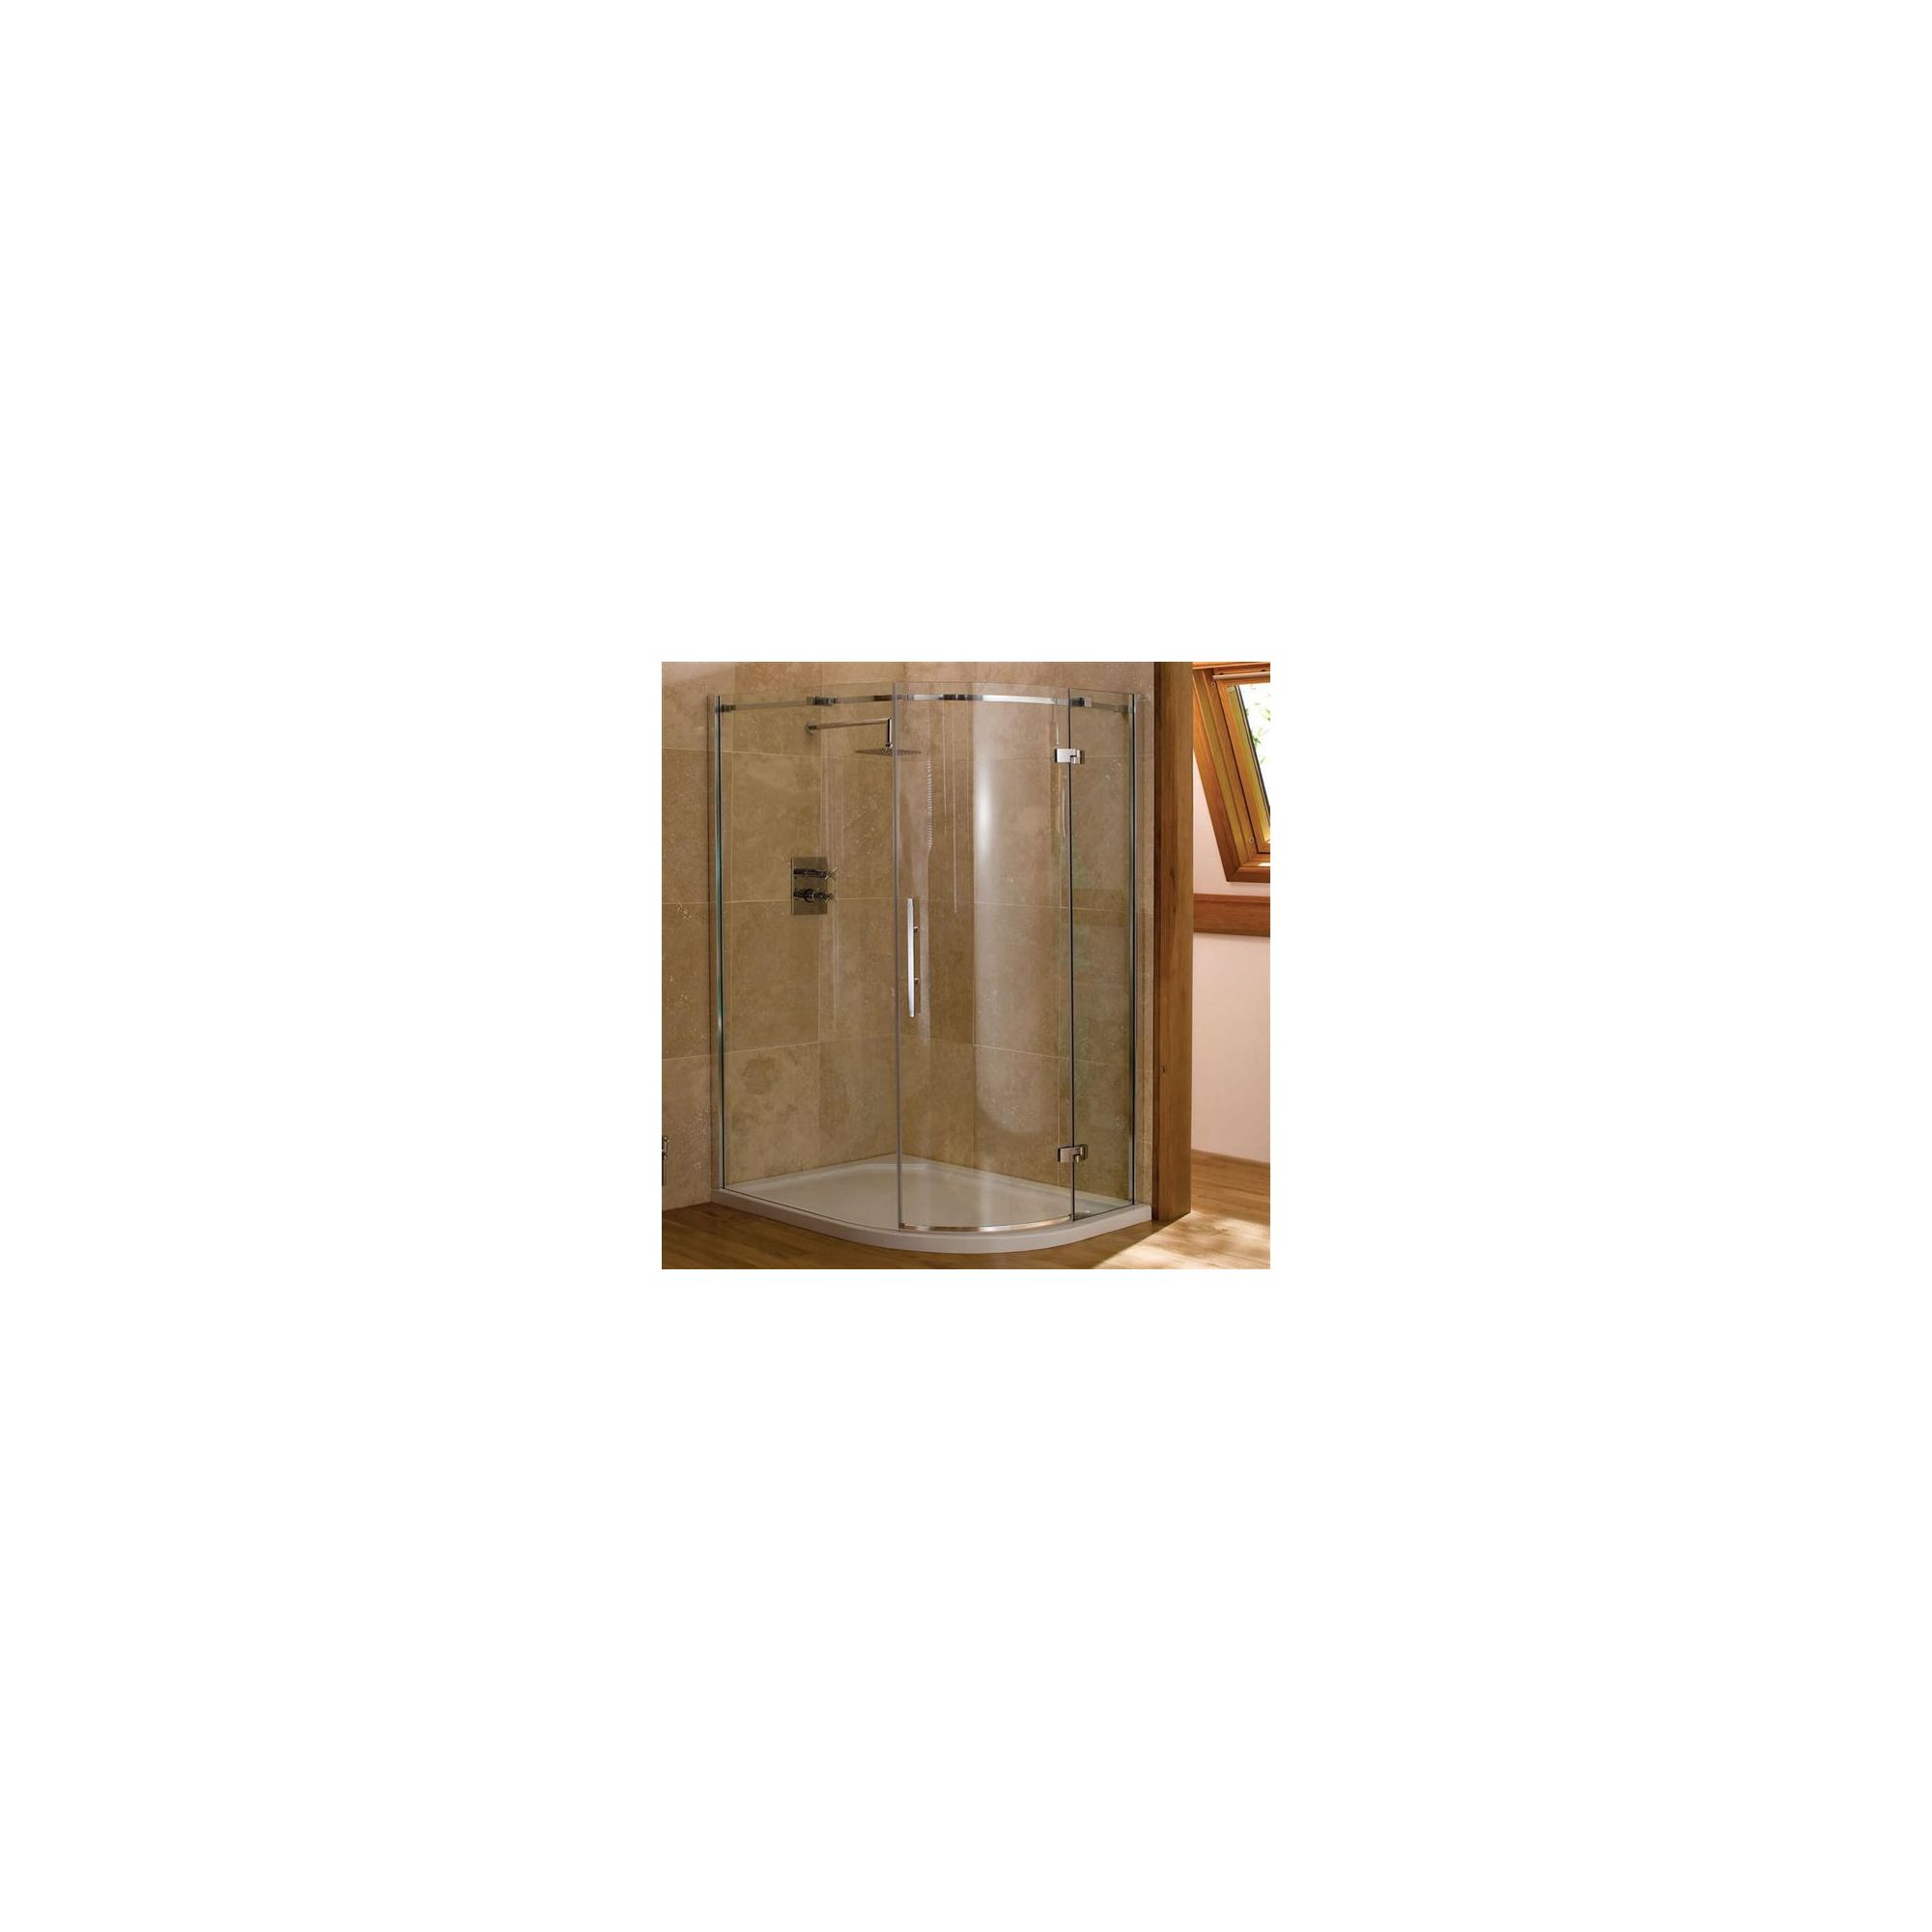 Merlyn Vivid Nine Offset Quadrant Shower Door, 1200mm x 900mm, Left Handed, 8mm Glass at Tesco Direct